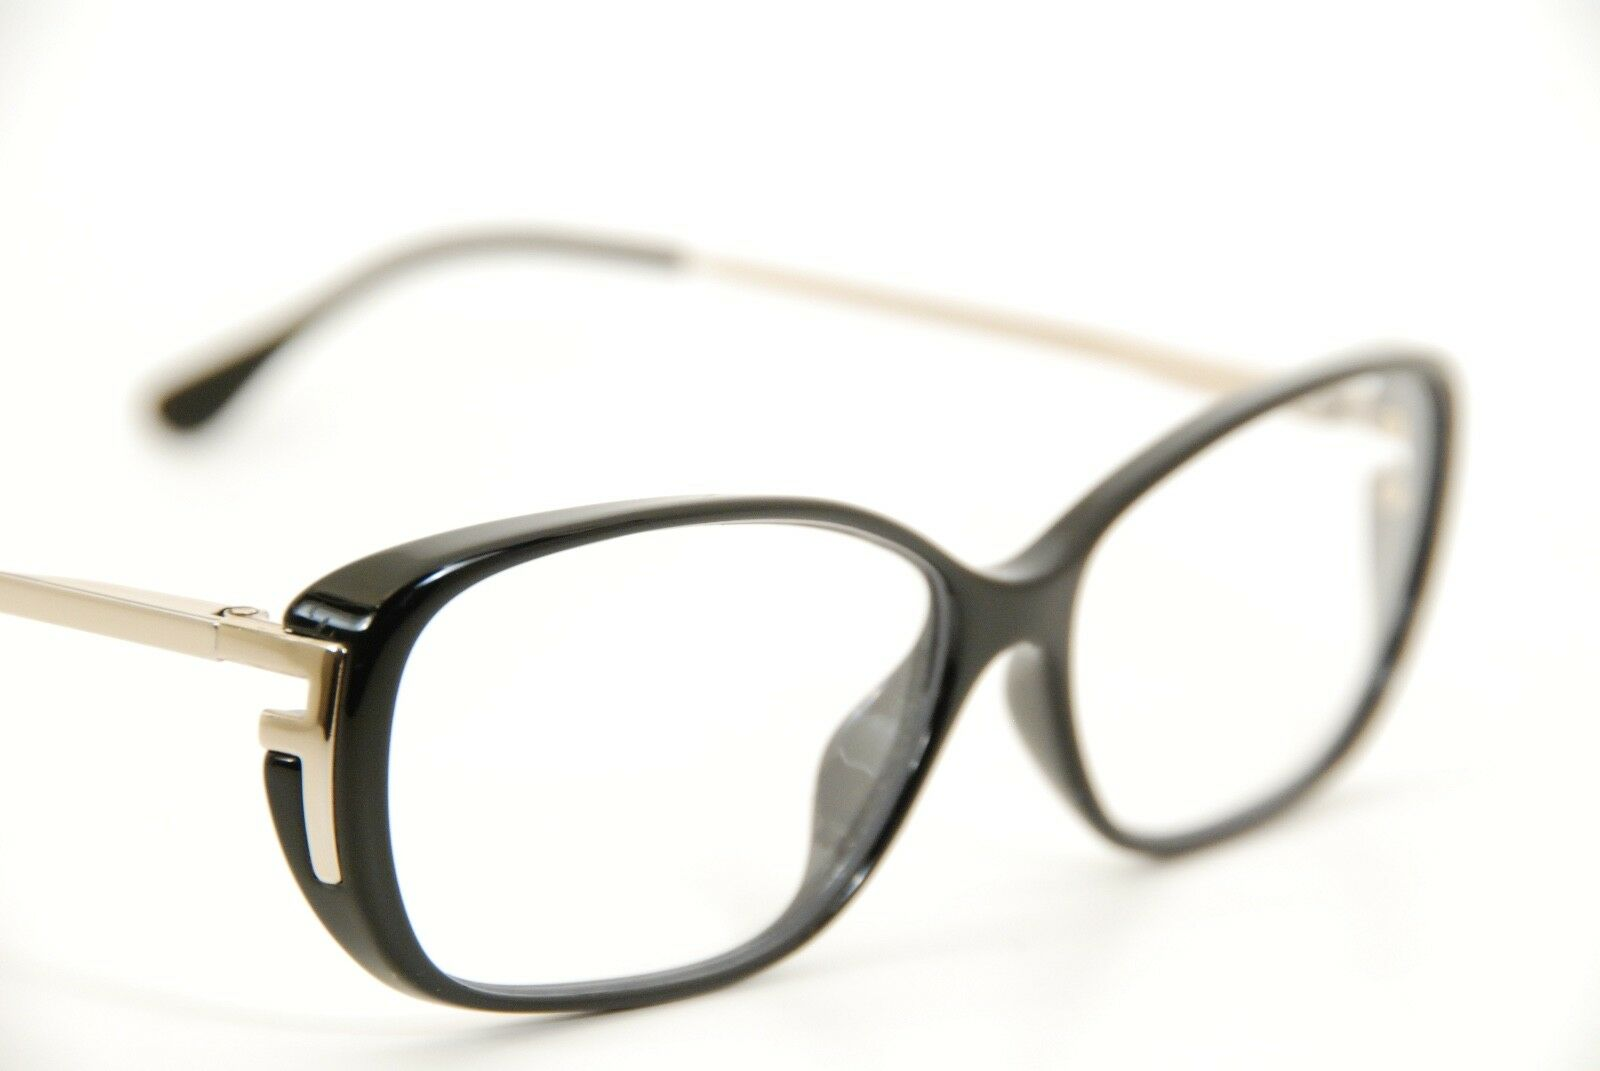 1ba03f268e1 Authentic Fendi F 969 001 Black pale Gold 55mm Frames Eyeglasses Italy RX  for sale online